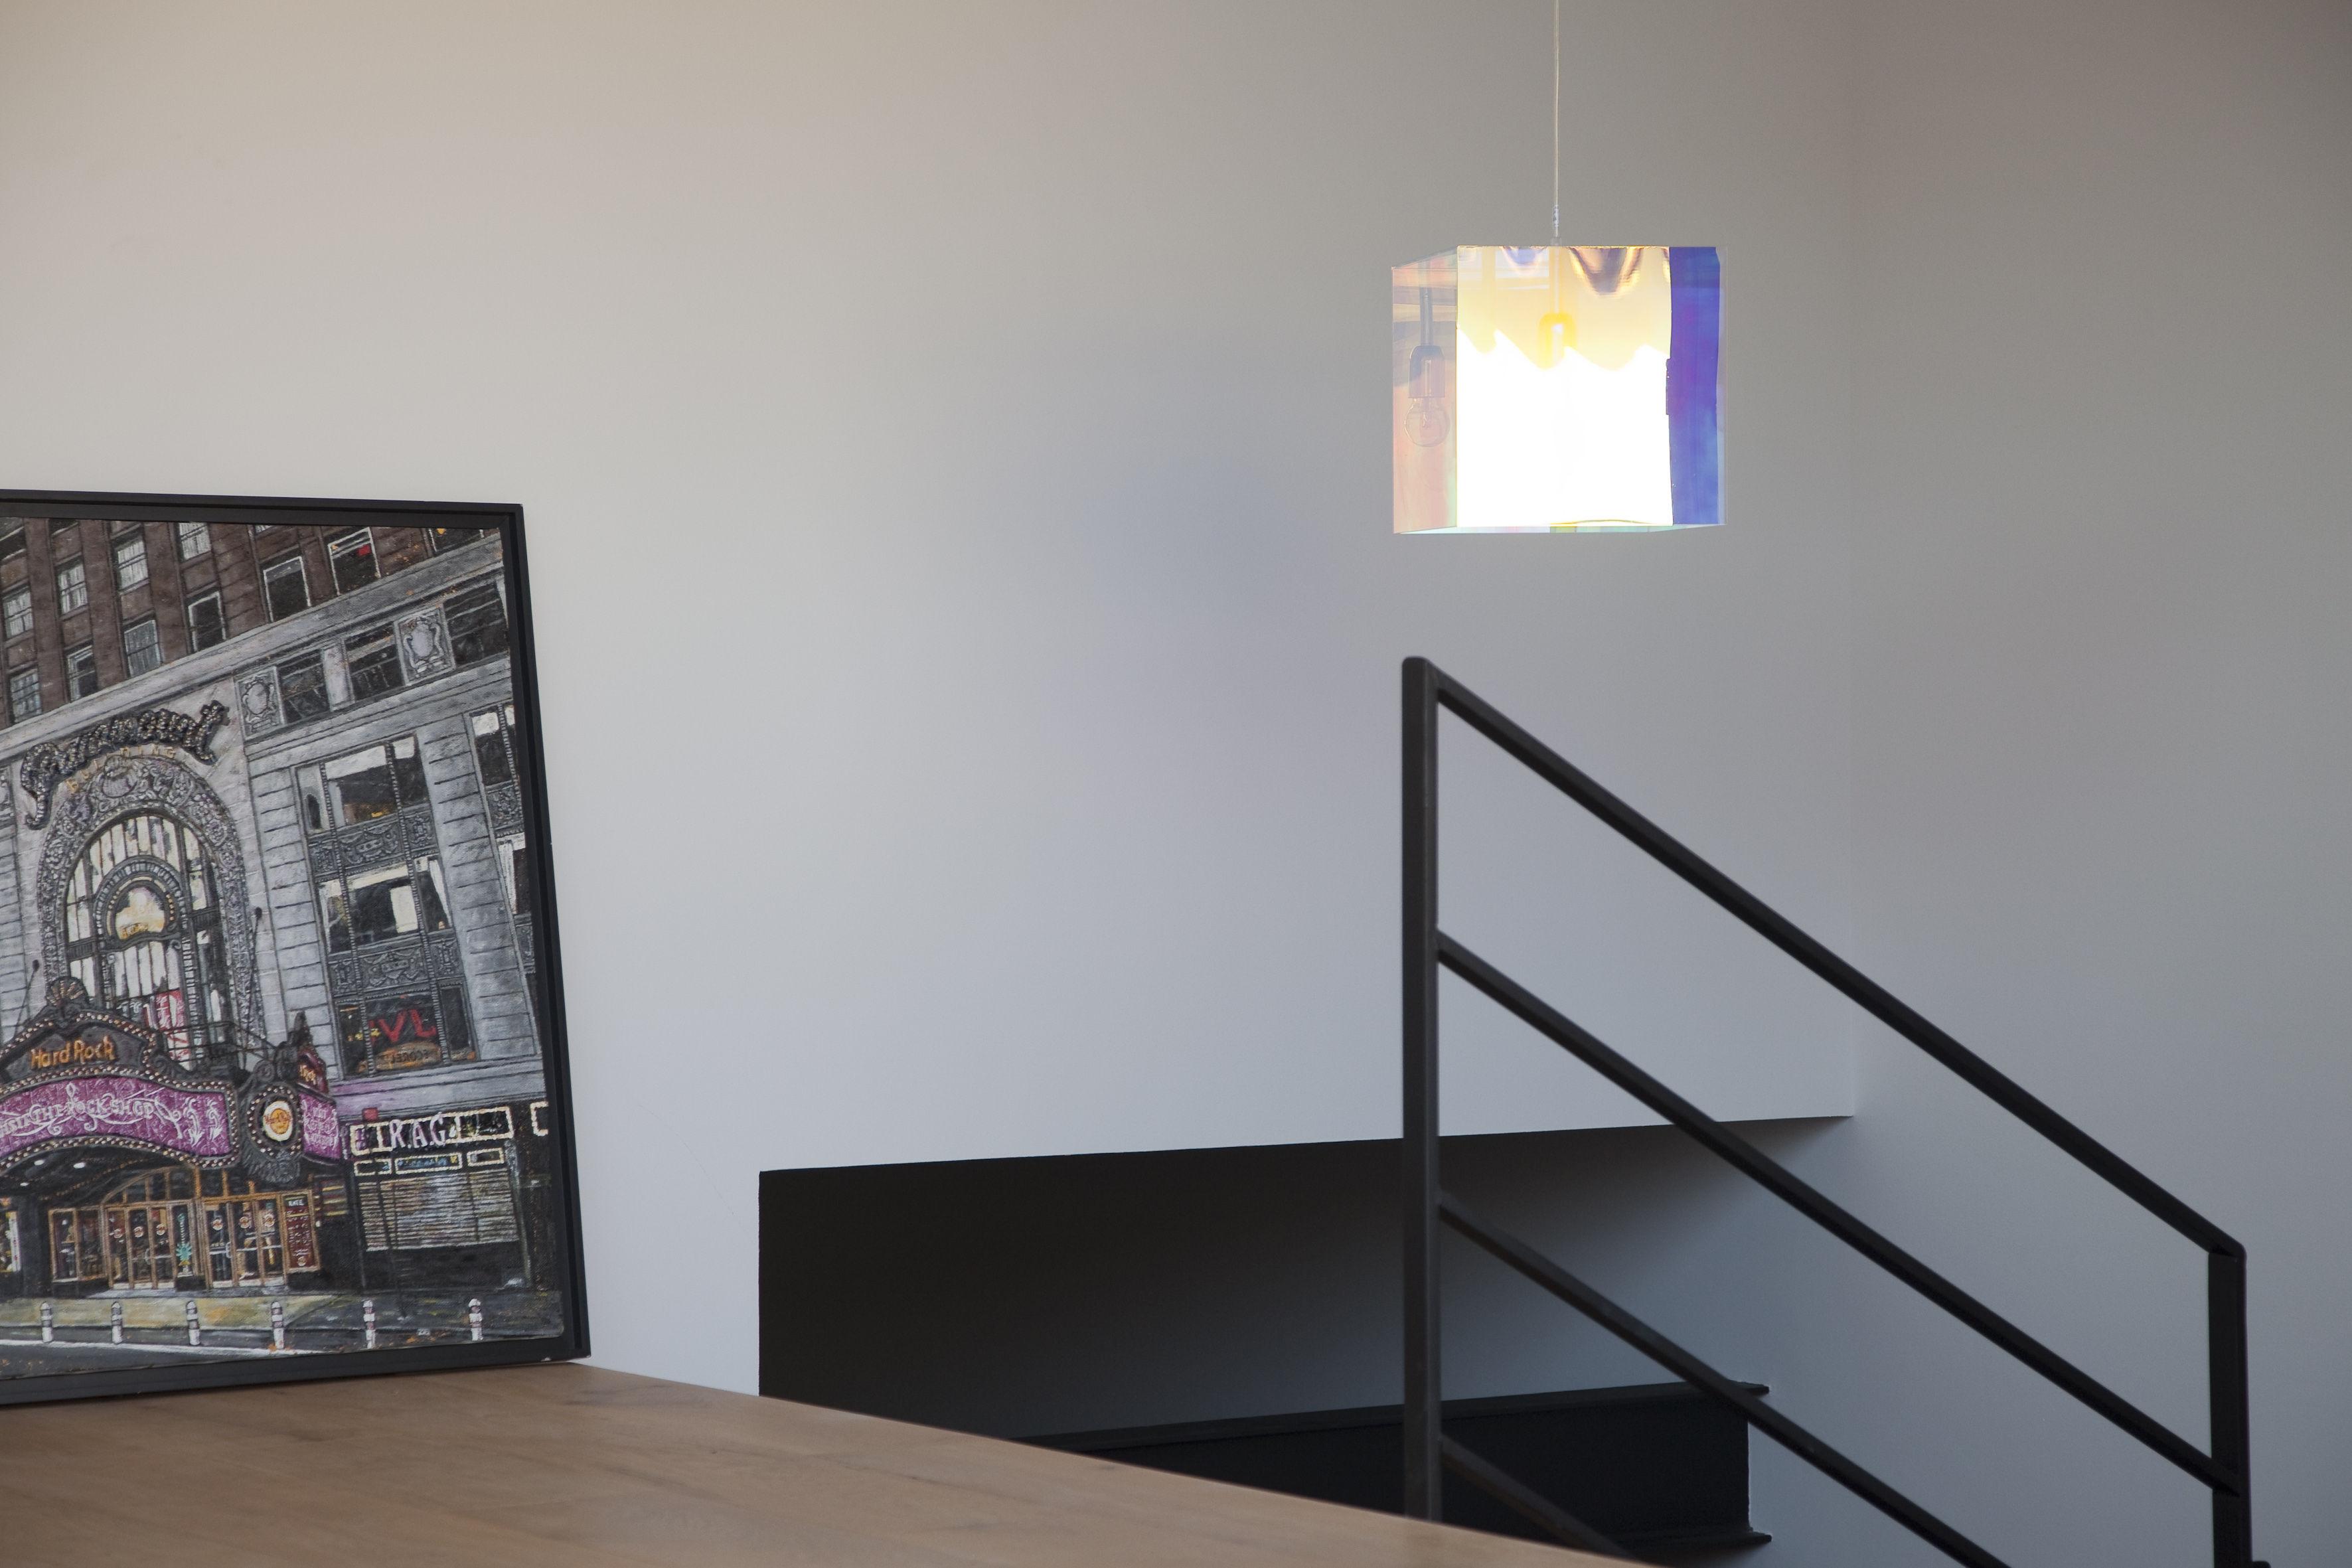 Cube miroir pendant mirror 15 6 x 15 6 cm by designheure for Cube miroir habitat